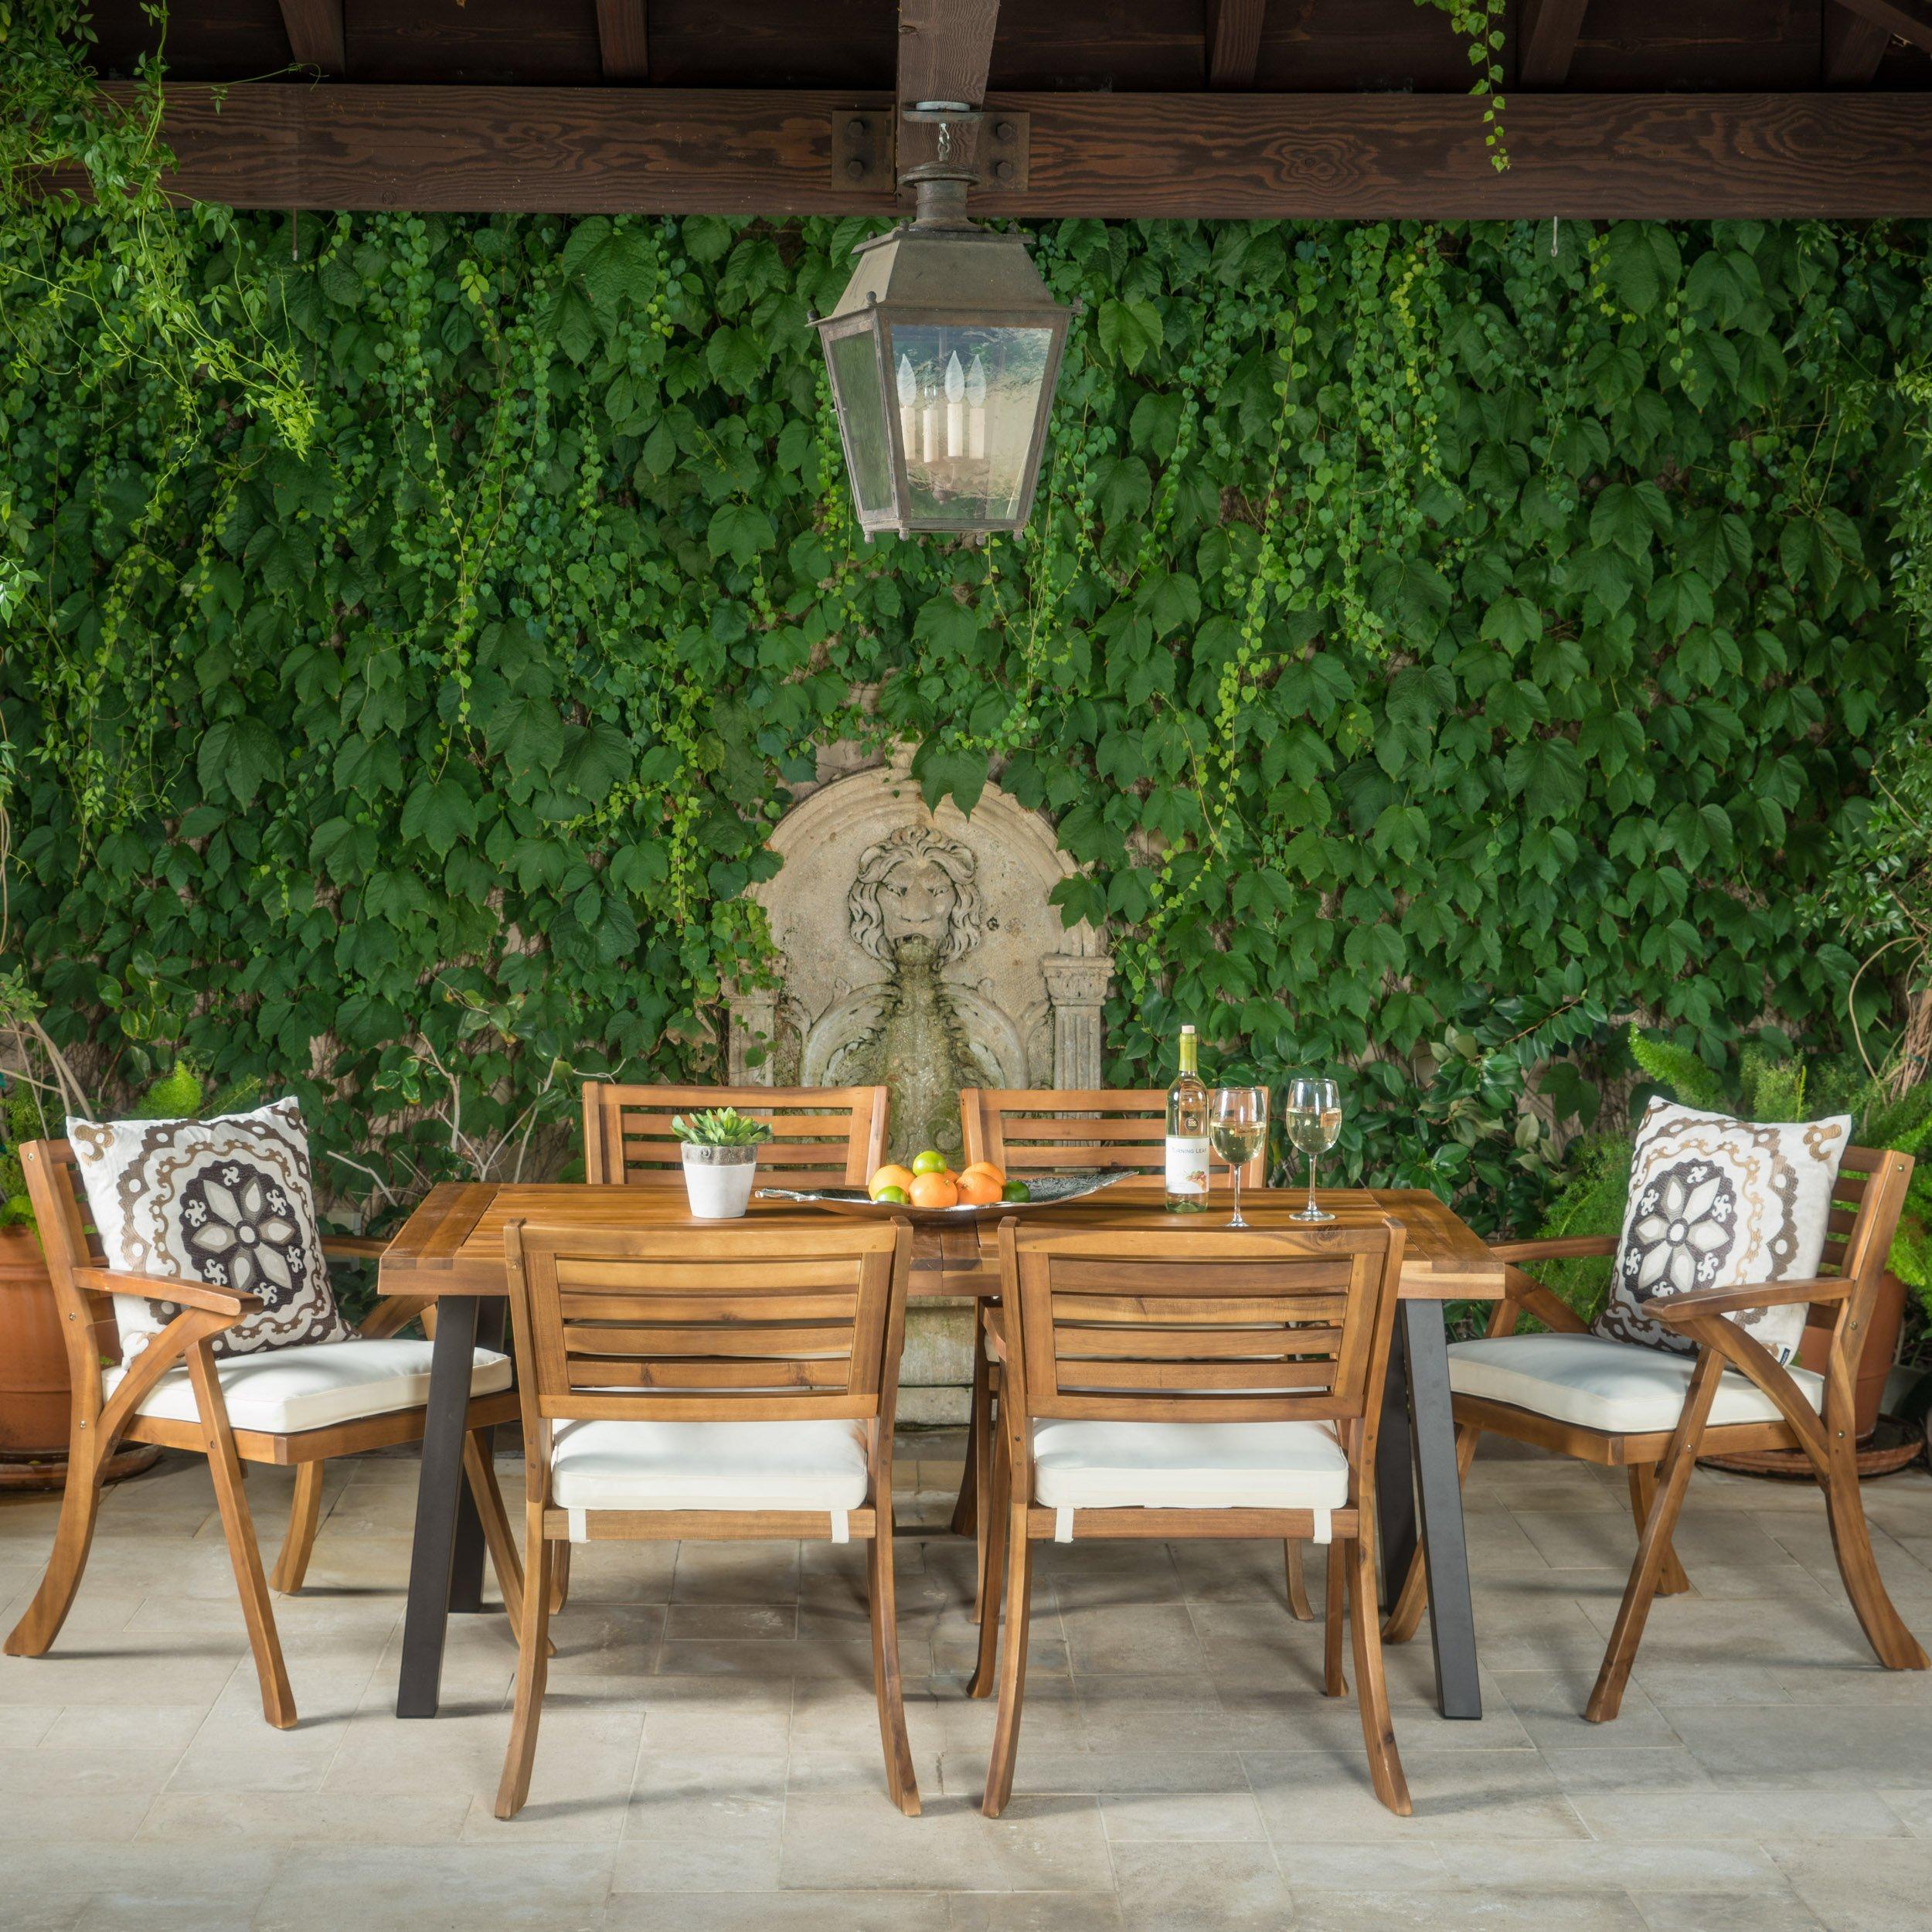 Christopher Knight Home DeSoto7 Piece Teak Finish Acacia Wood Patio Dining Set